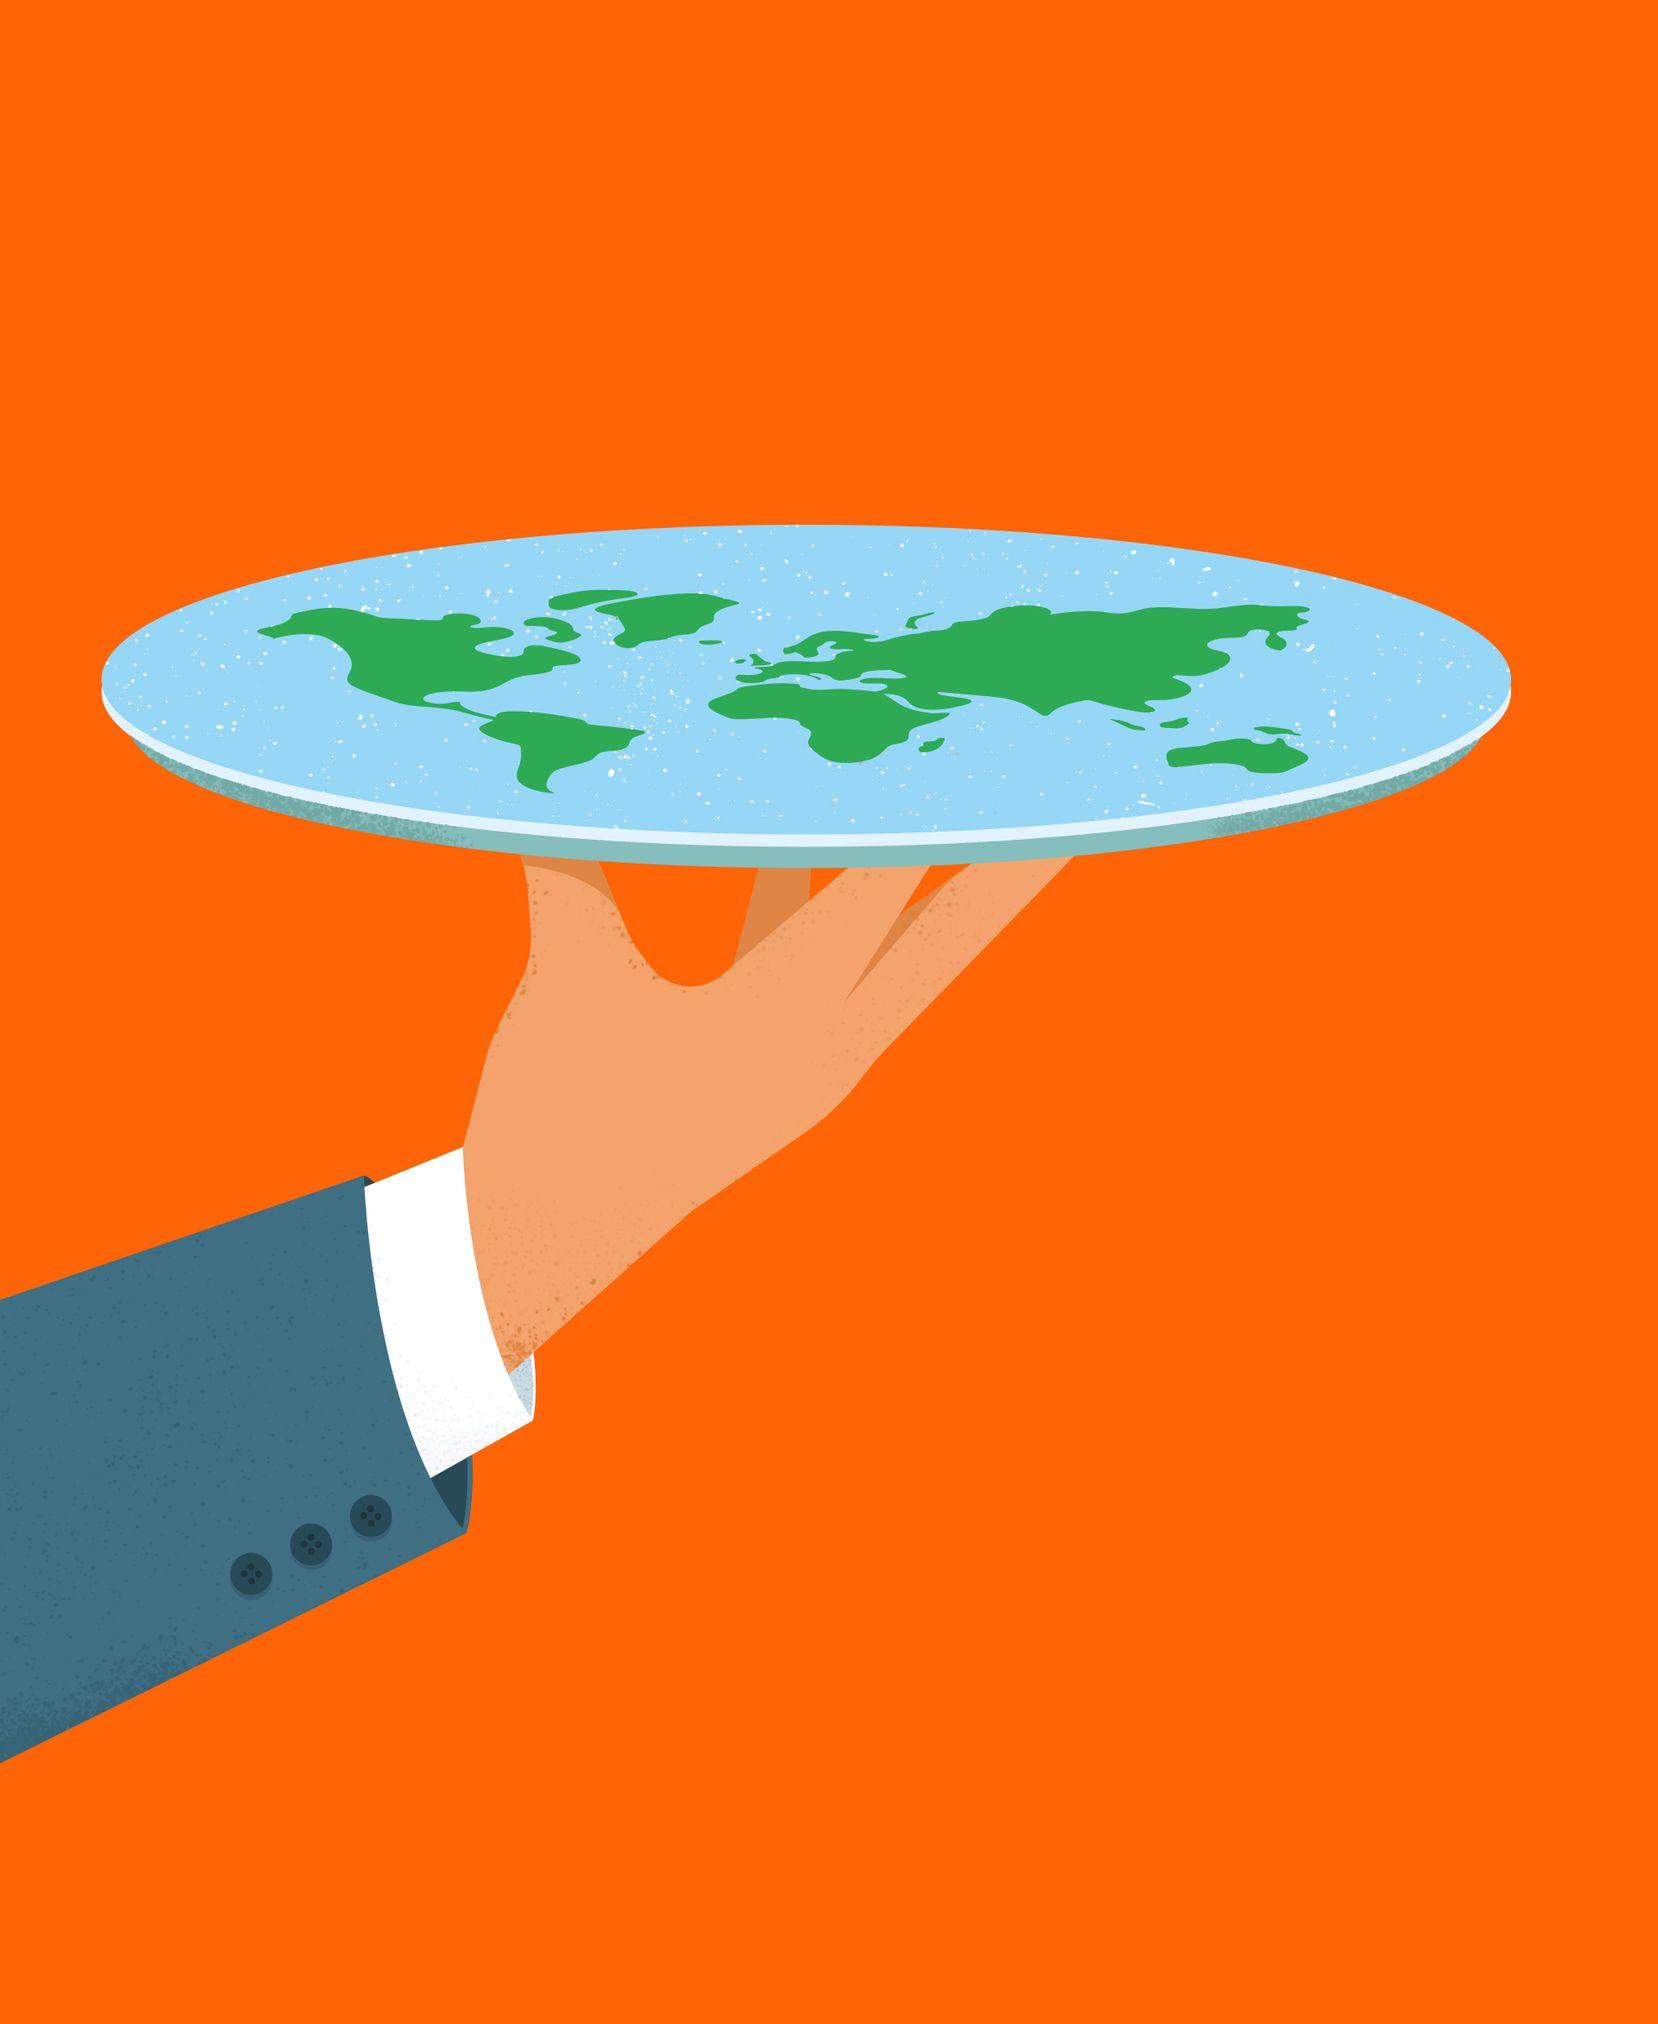 garance-illustration-Pelerin-Conspiracy-Flat-Earth_web